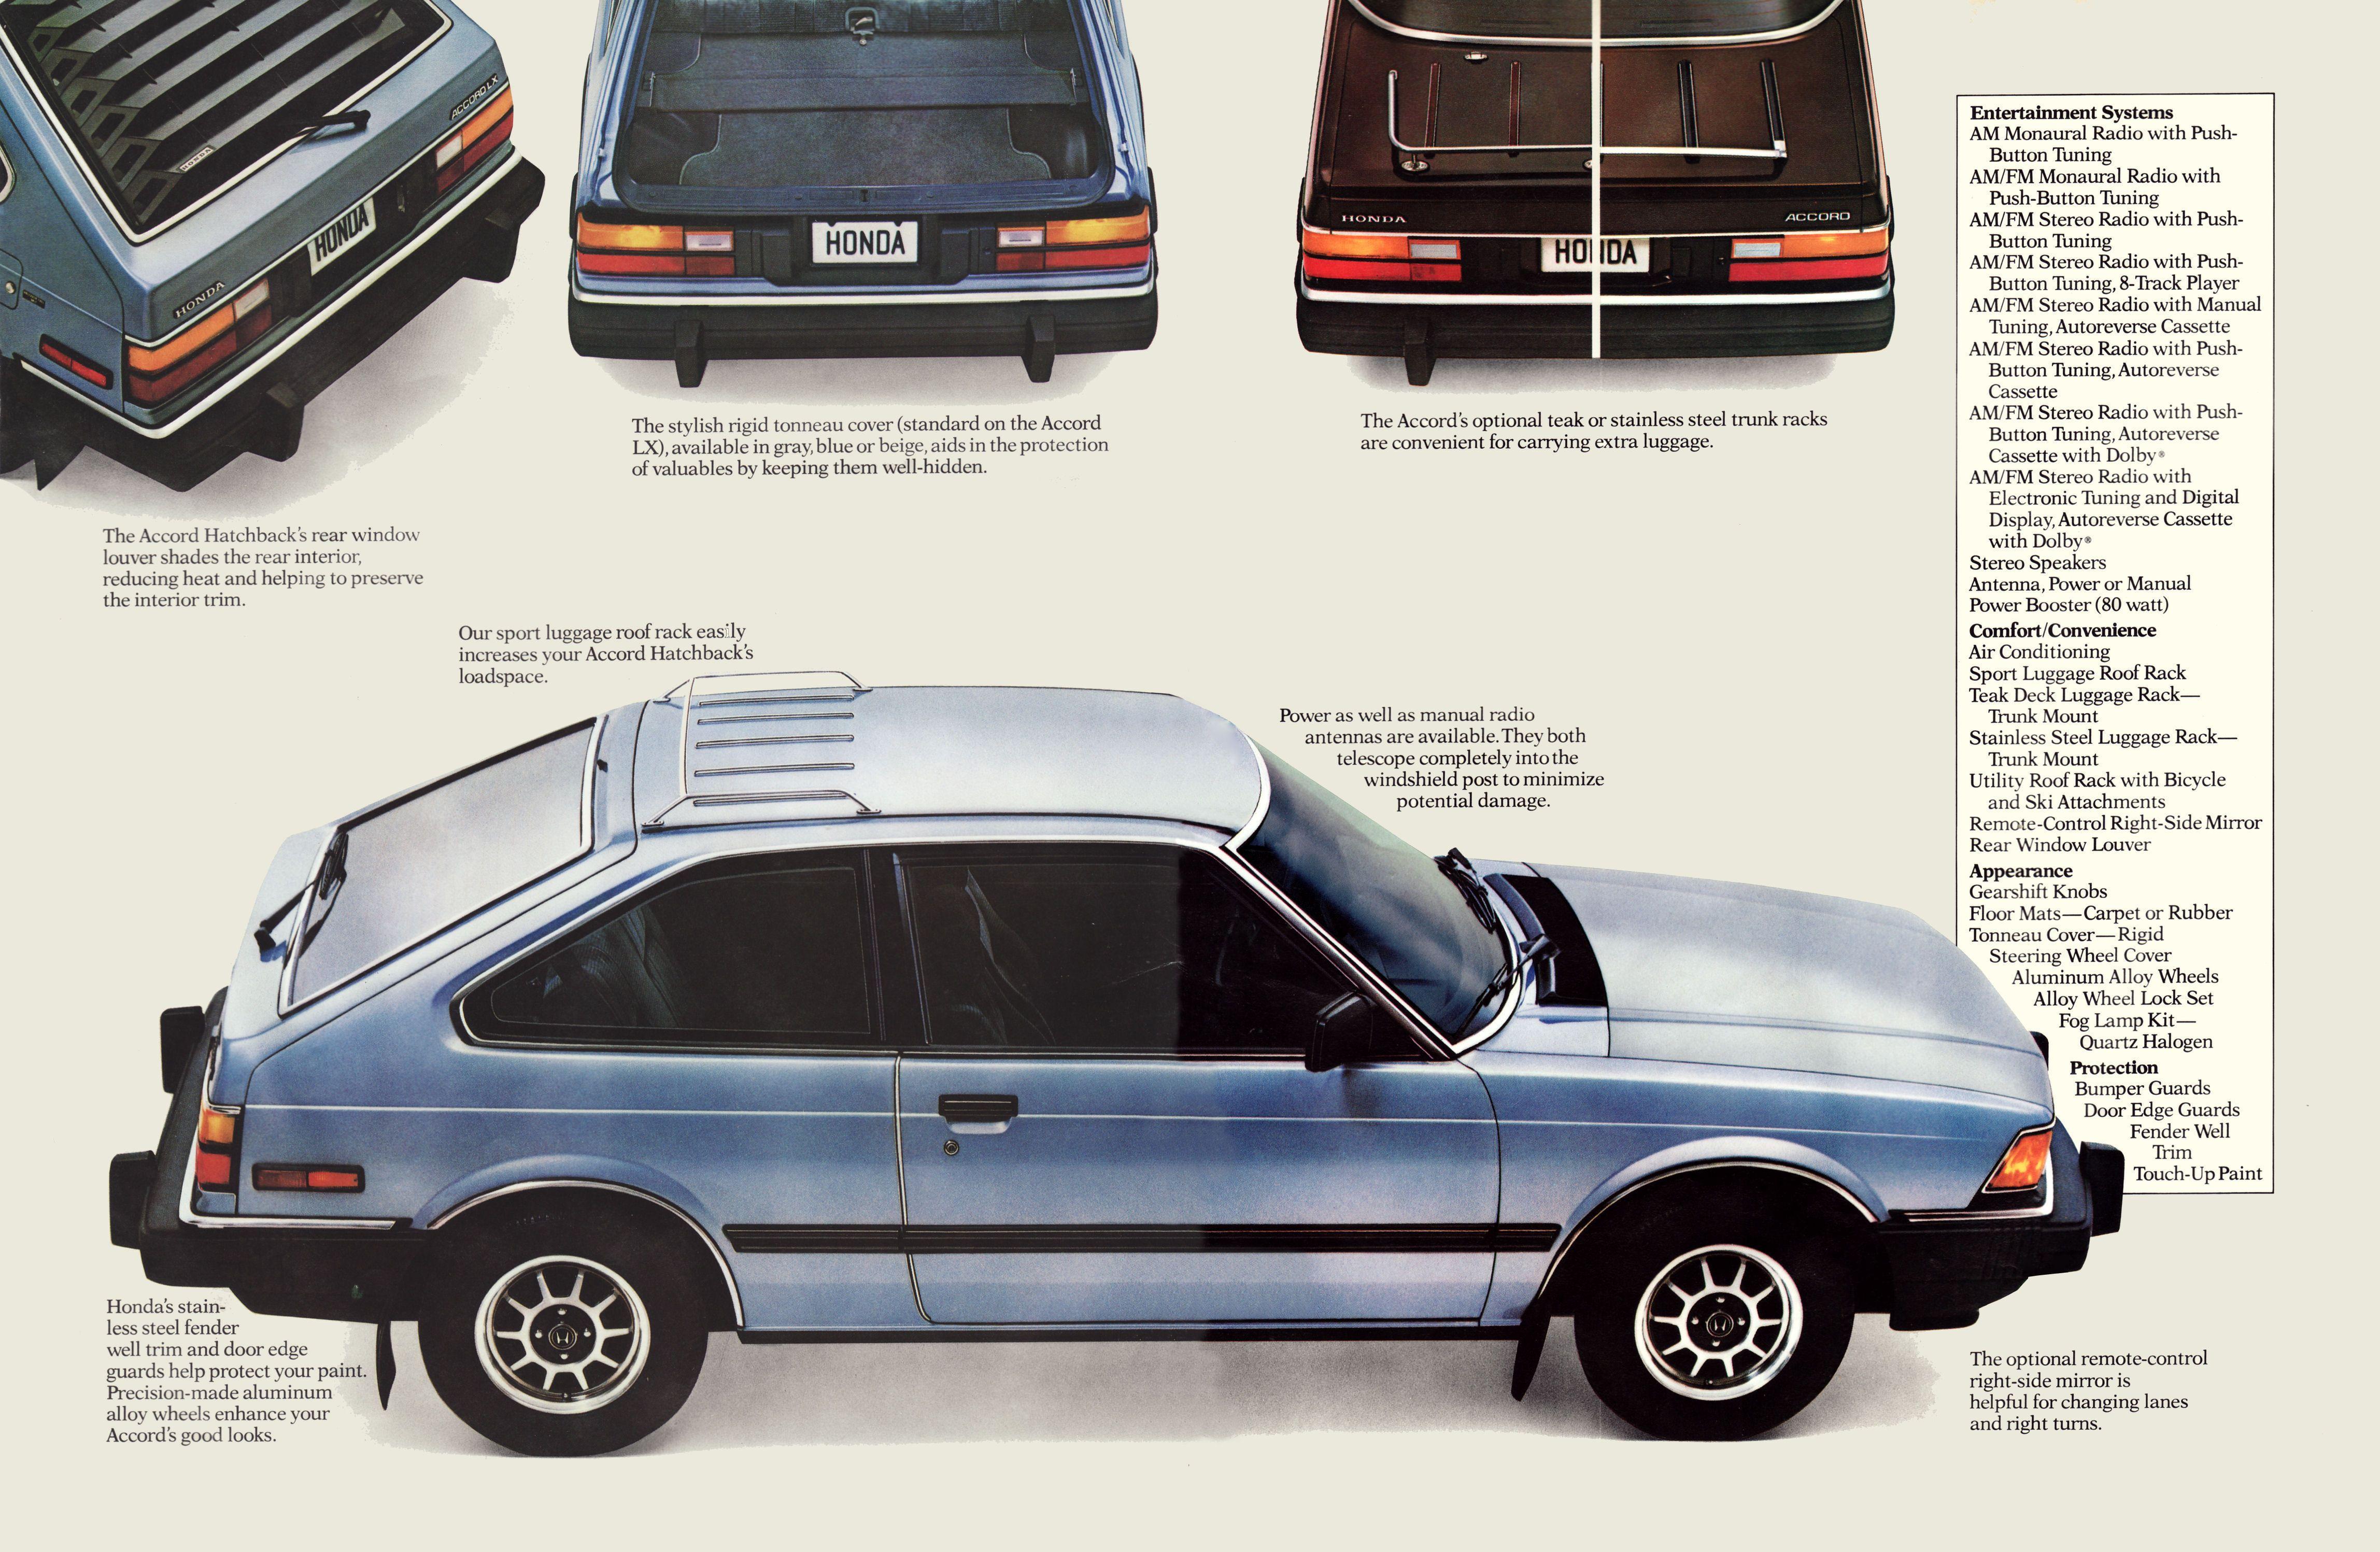 1982 Honda Accord Hatchback